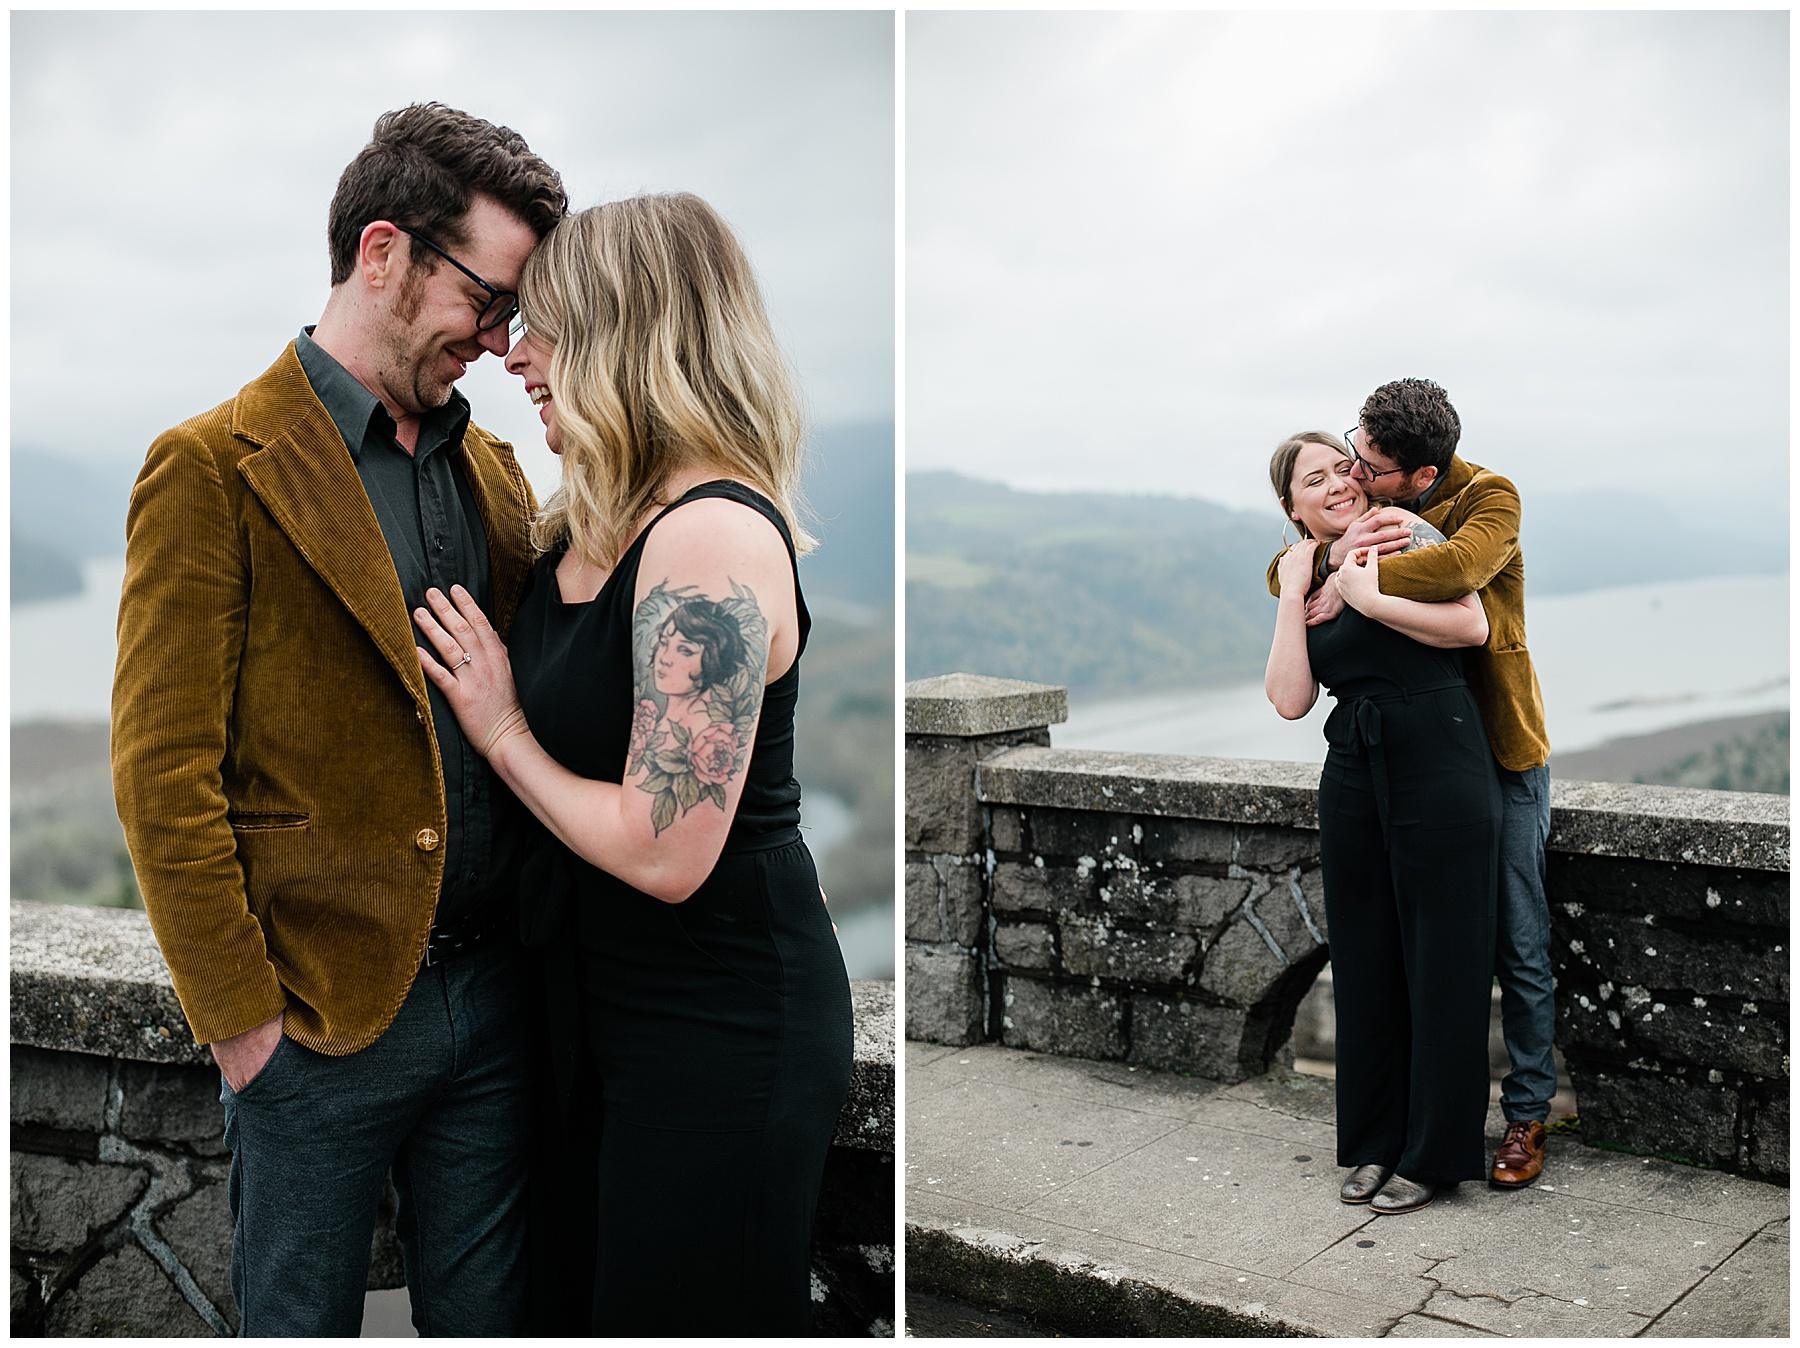 Hana & Pete Fine Art Engagement Session Columbia River Gorge Oregon, Fine Art Wedding Photographer Portland, Oregon